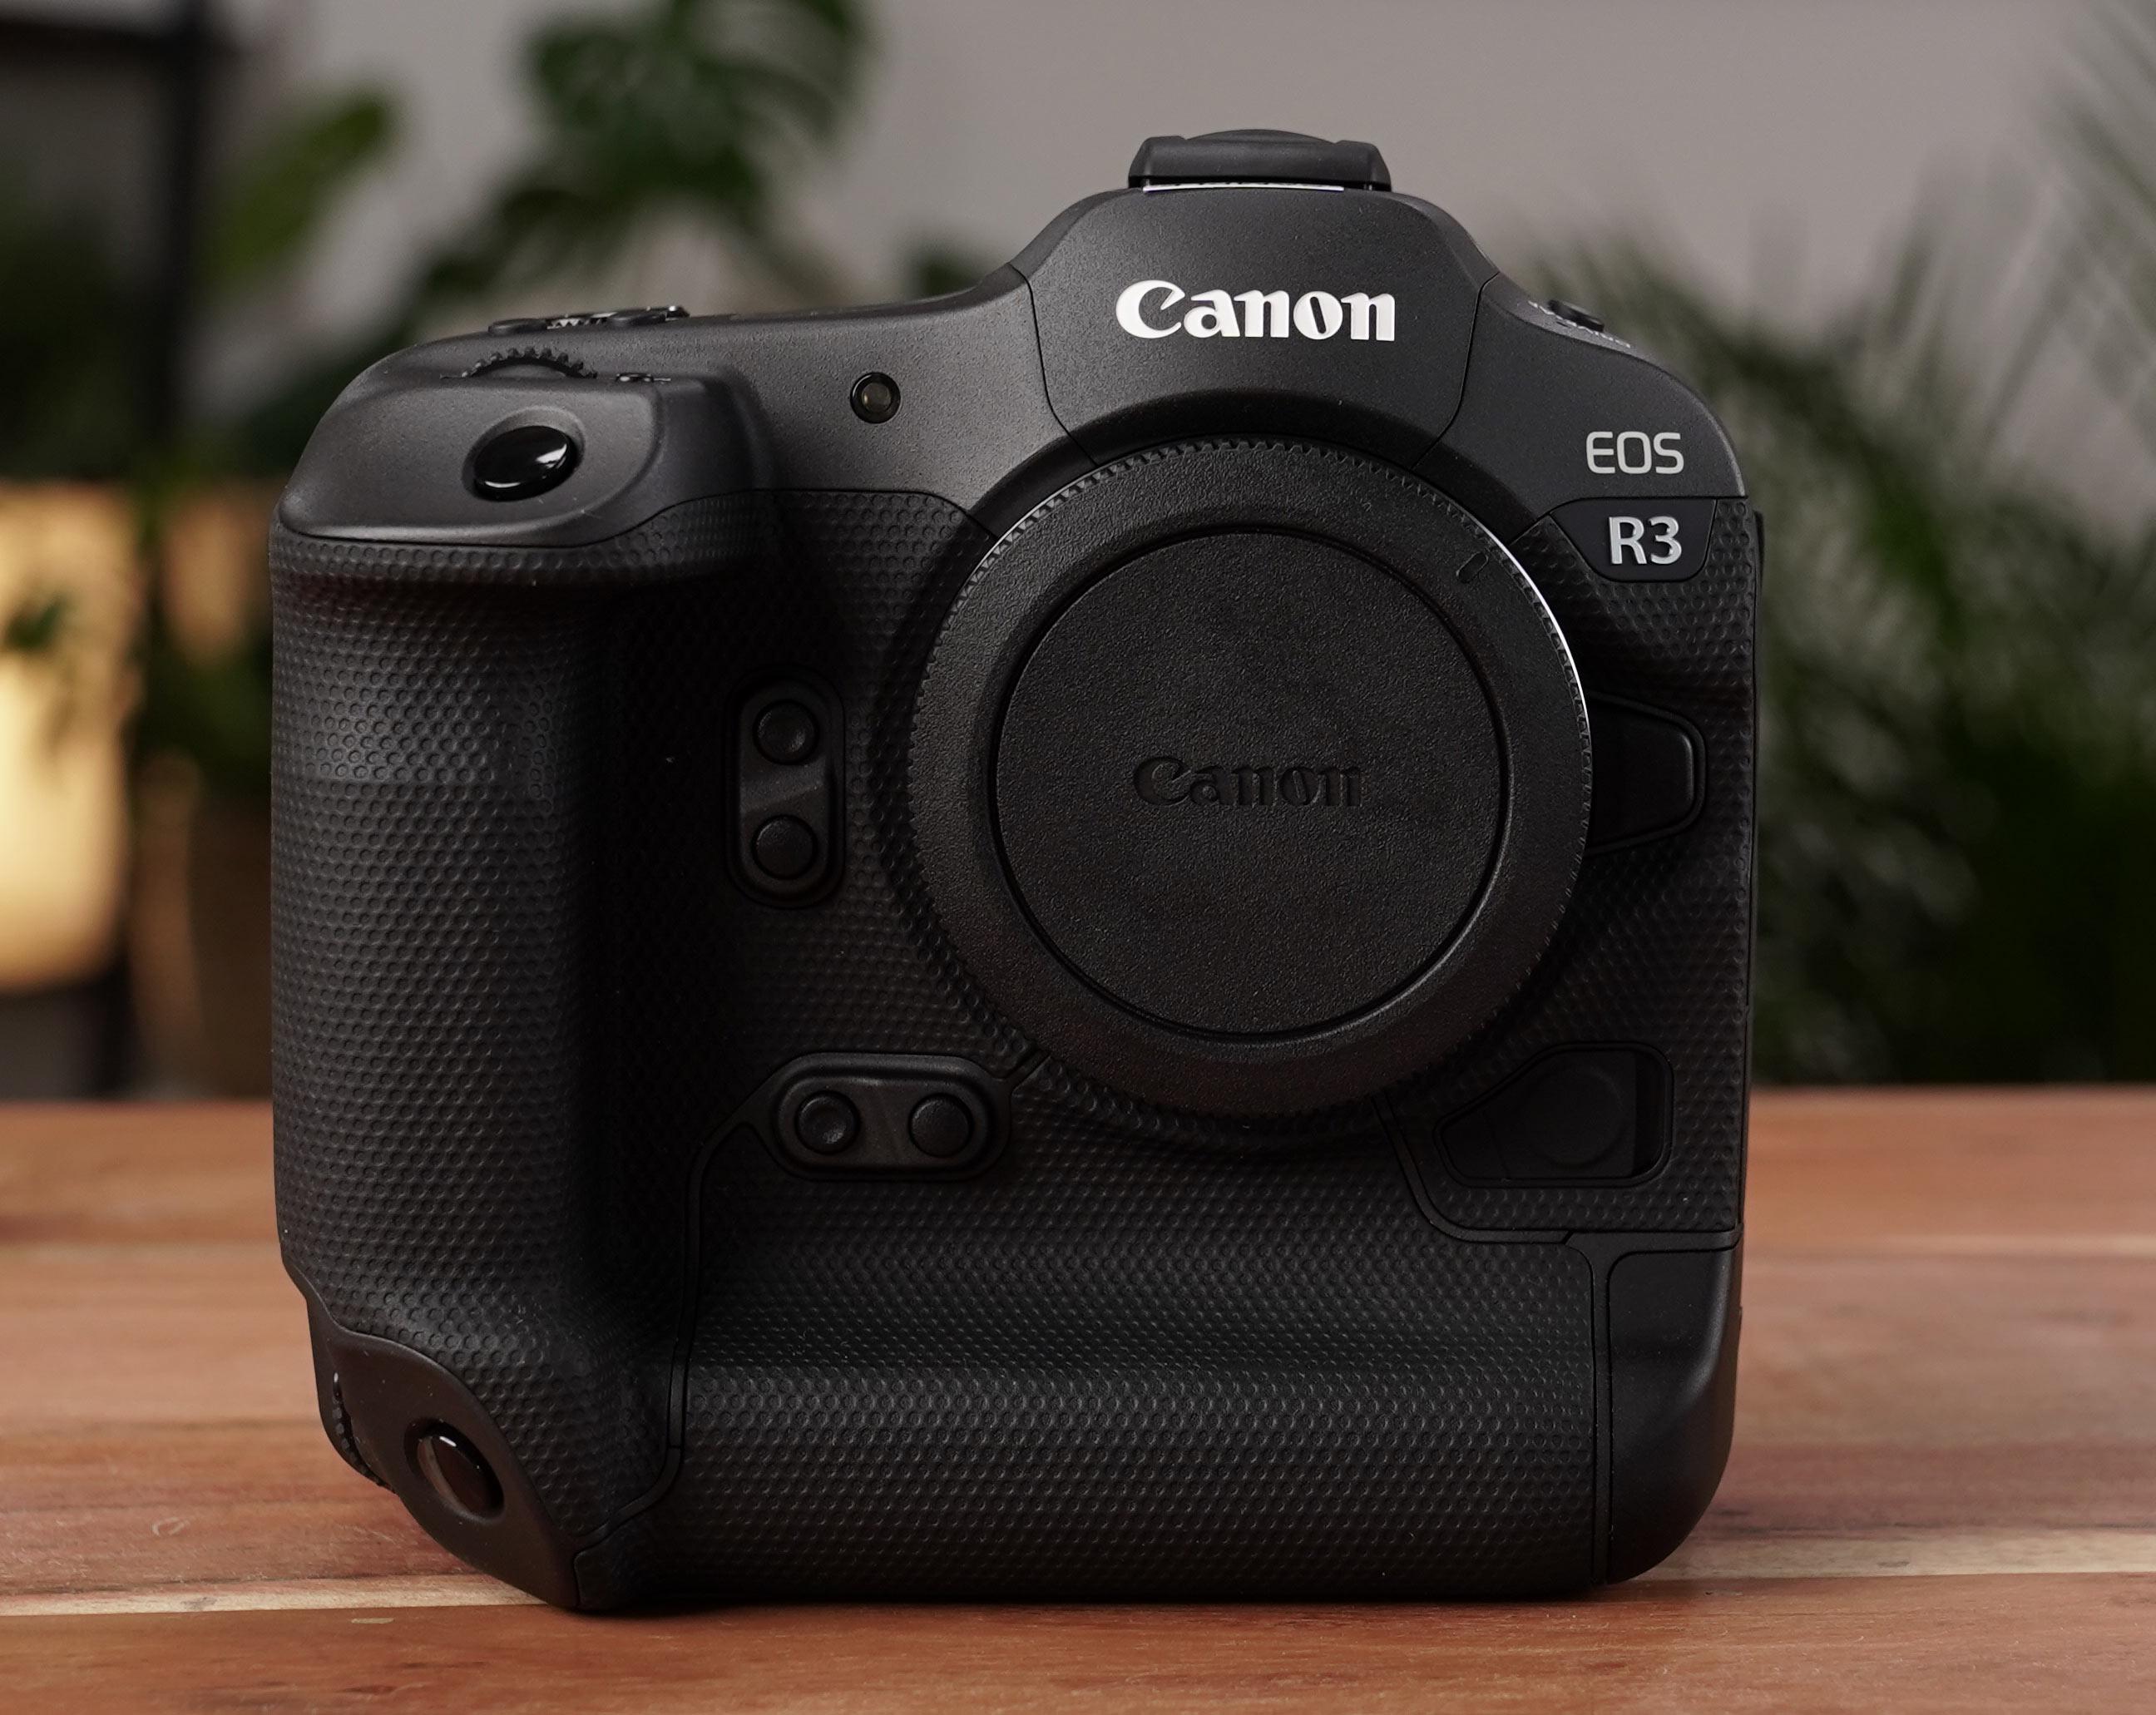 Canon EOS R3 - Front